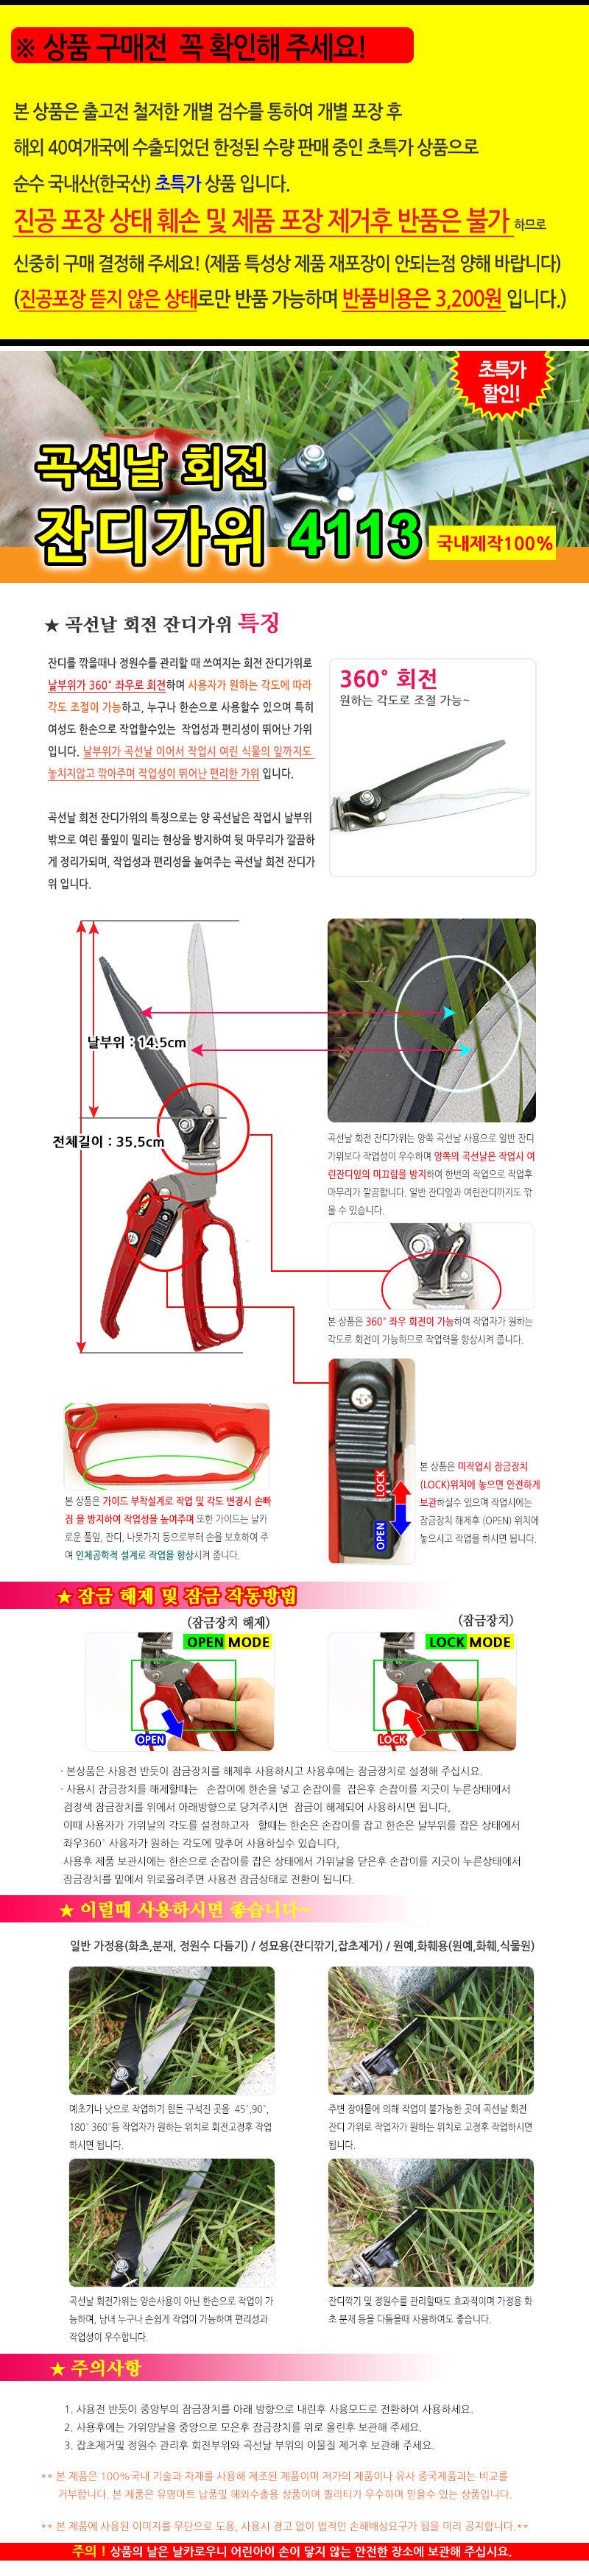 scissors-4113.jpg